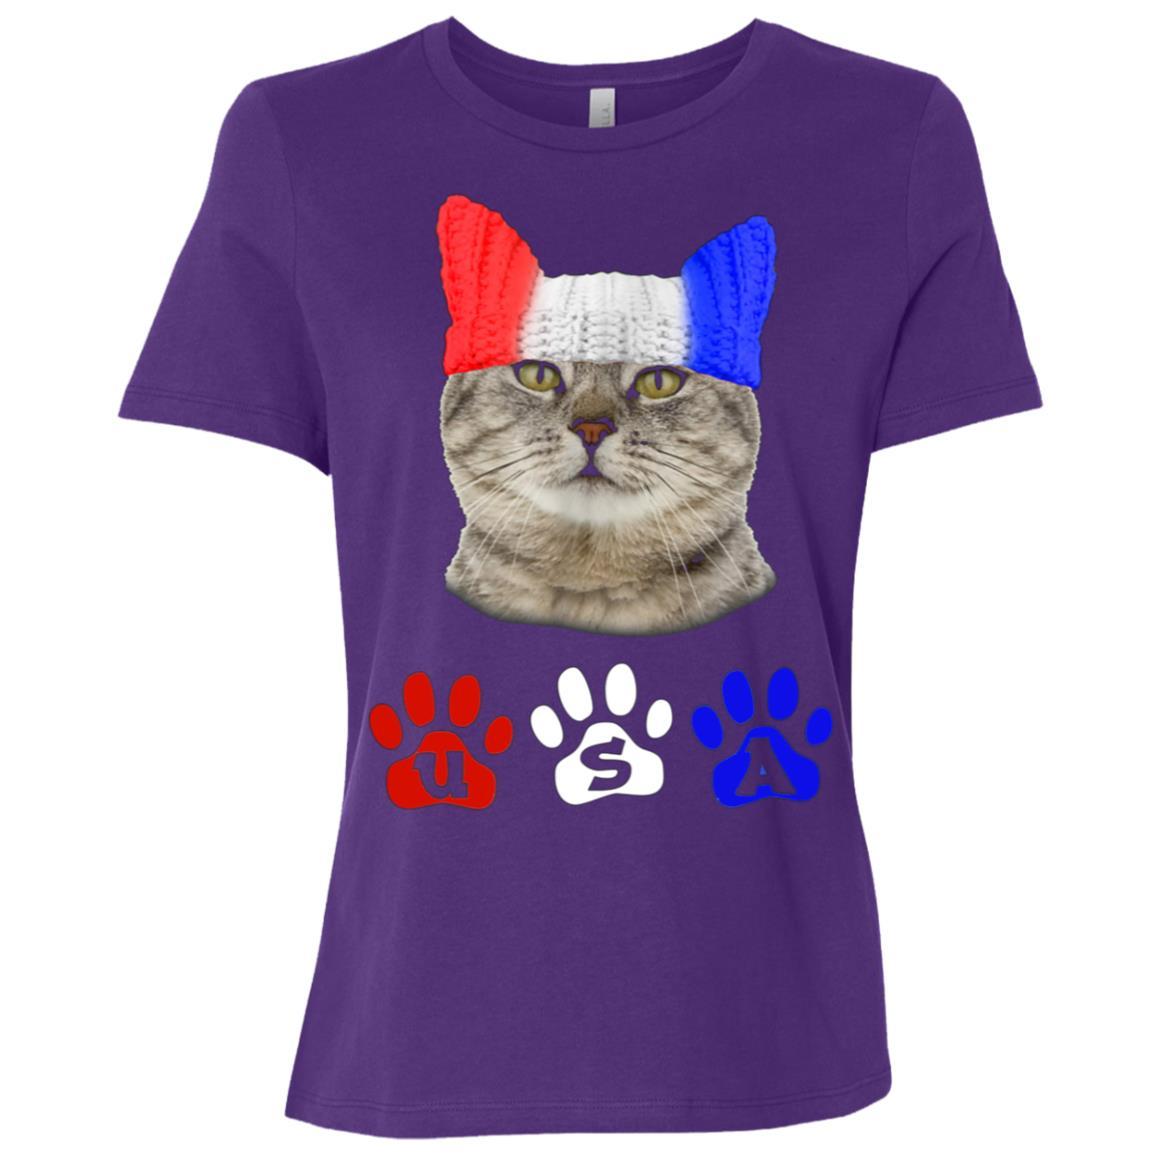 4th of July USA Cat Women Short Sleeve T-Shirt